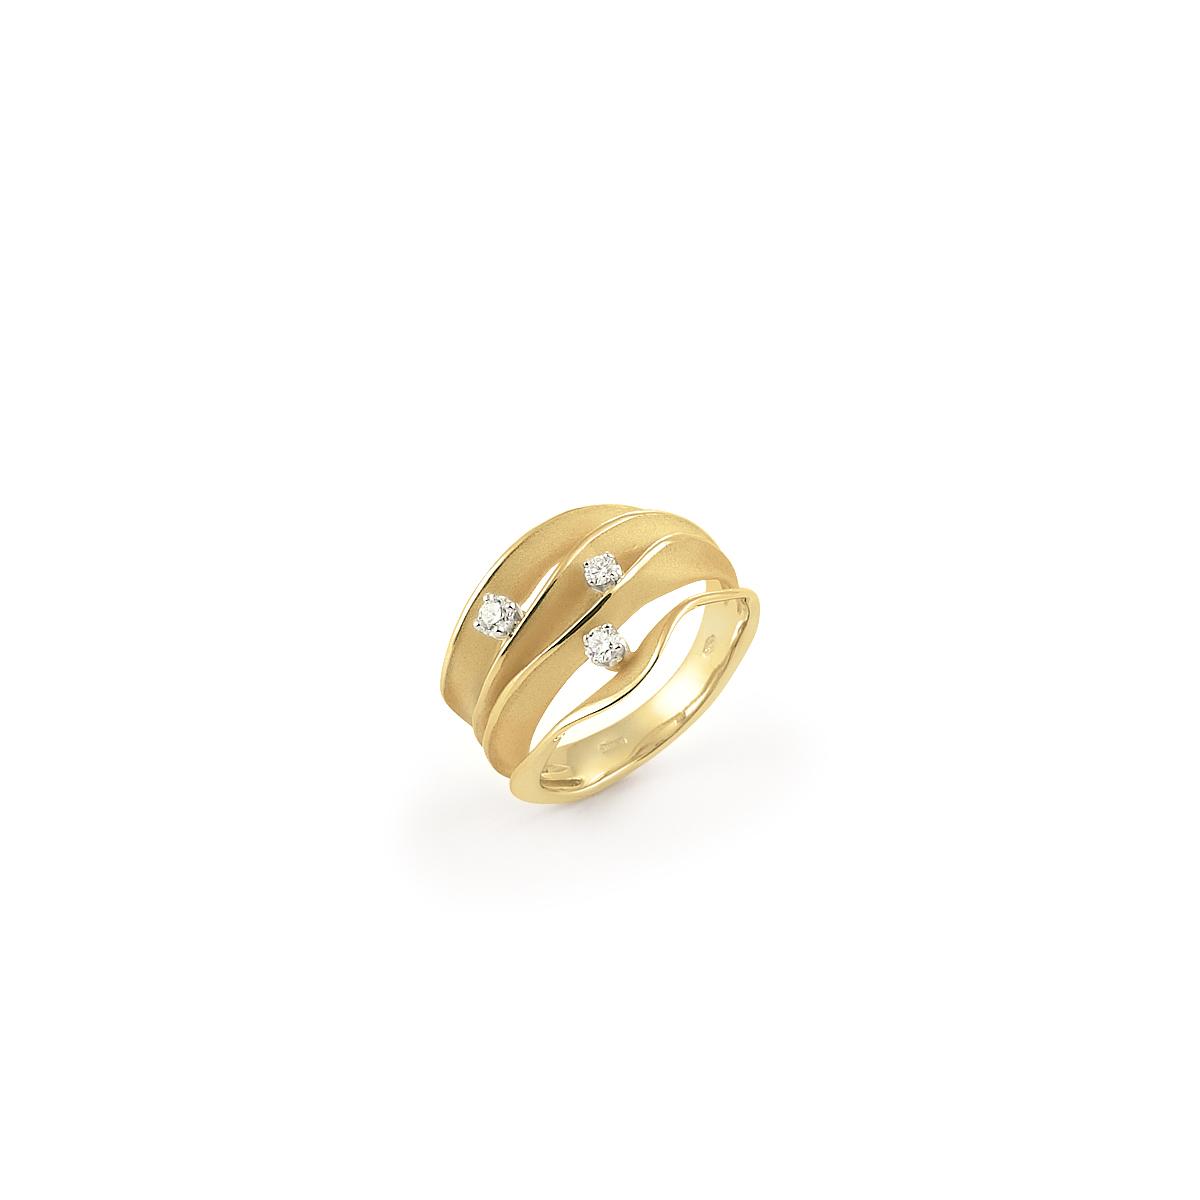 Annamaria Cammilli Dune Ring aus 18 Karat Yellow Sunrise Gold mit Brillanten